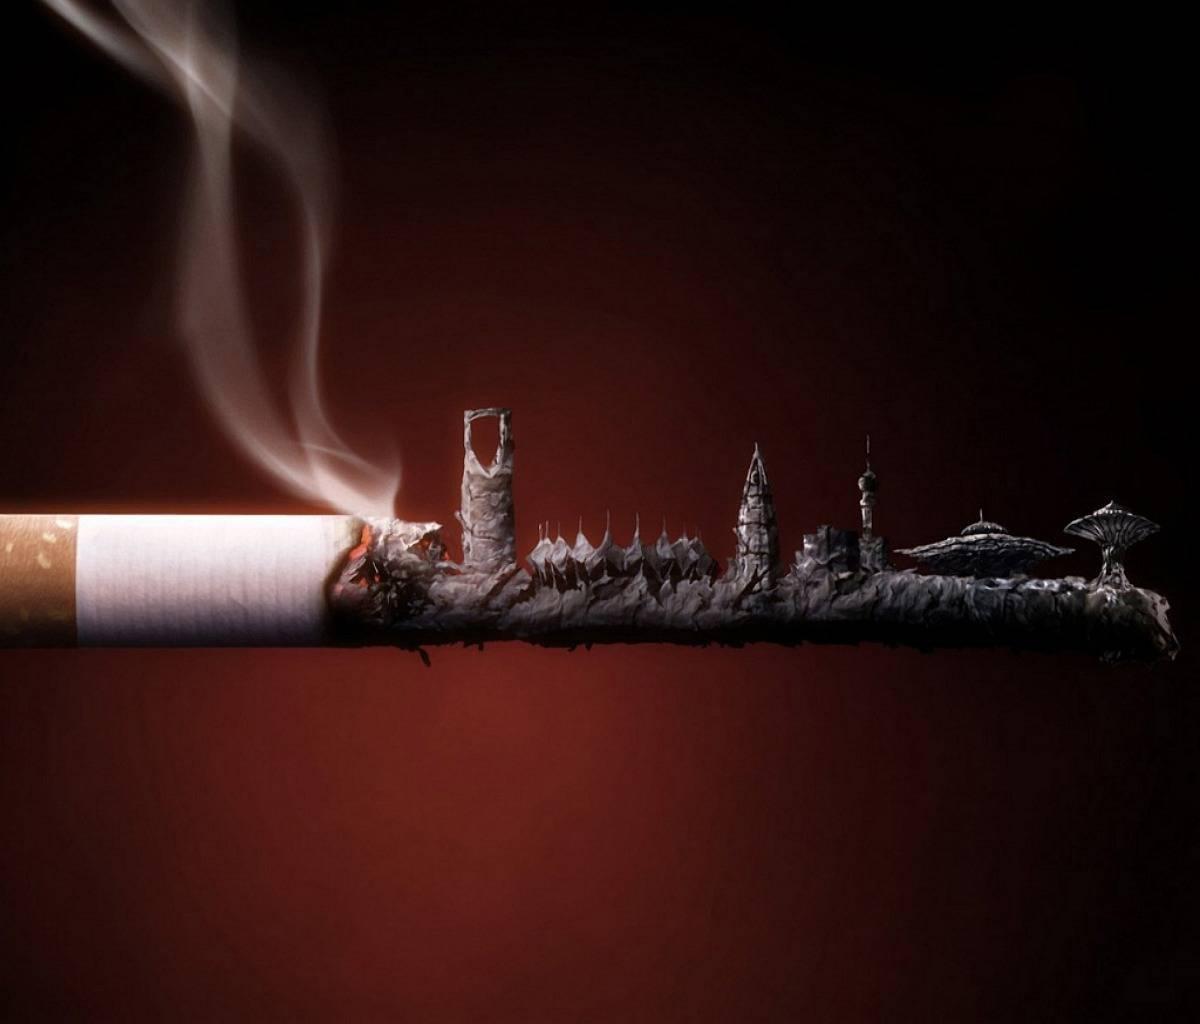 Smoking Kills Hd